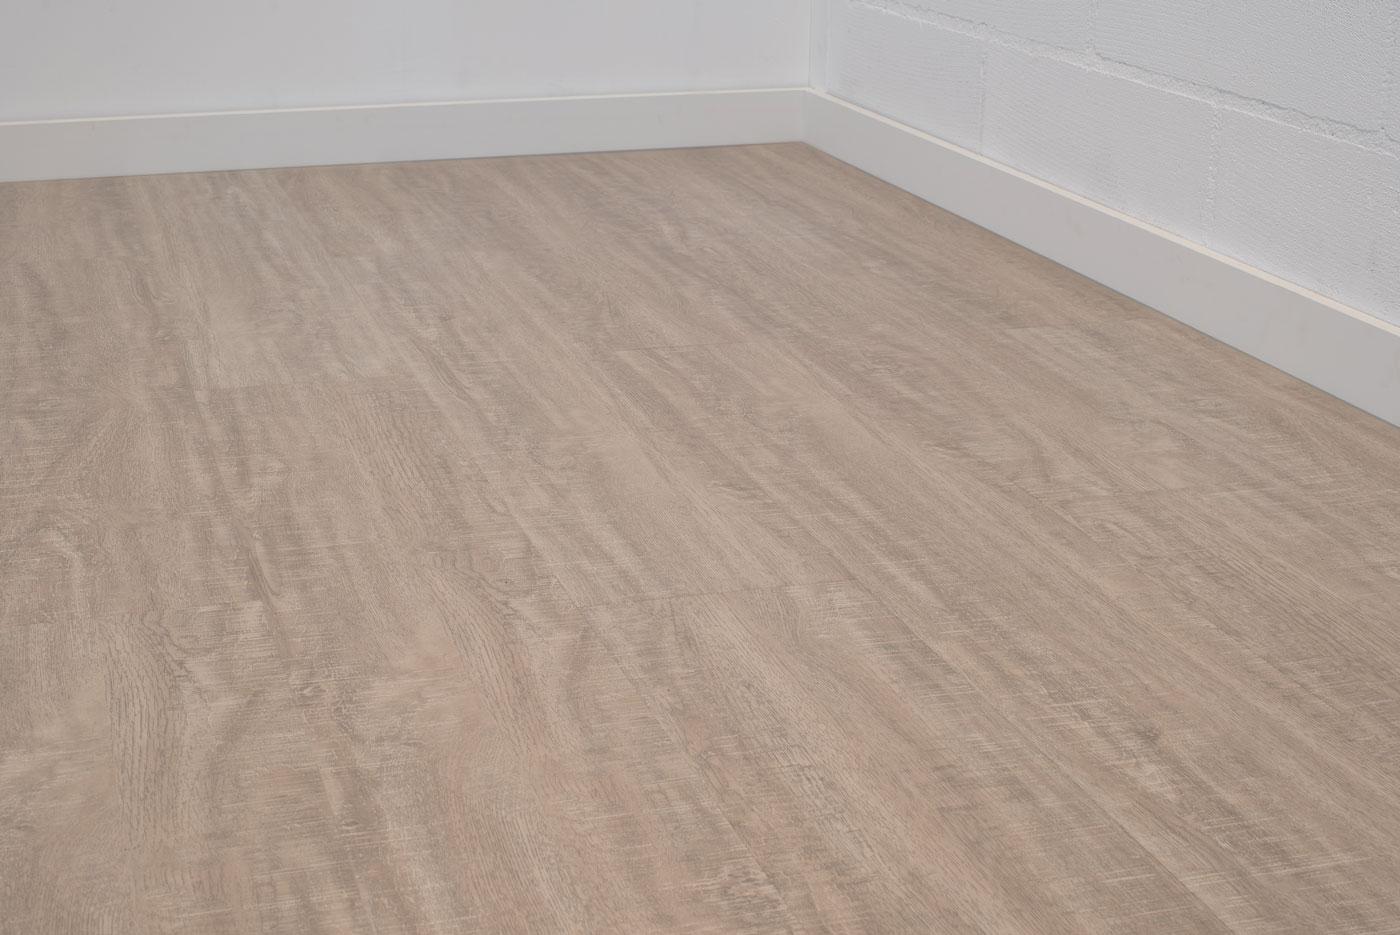 Floer stroken pvc vloer planken helmond grey wash eik vloeren